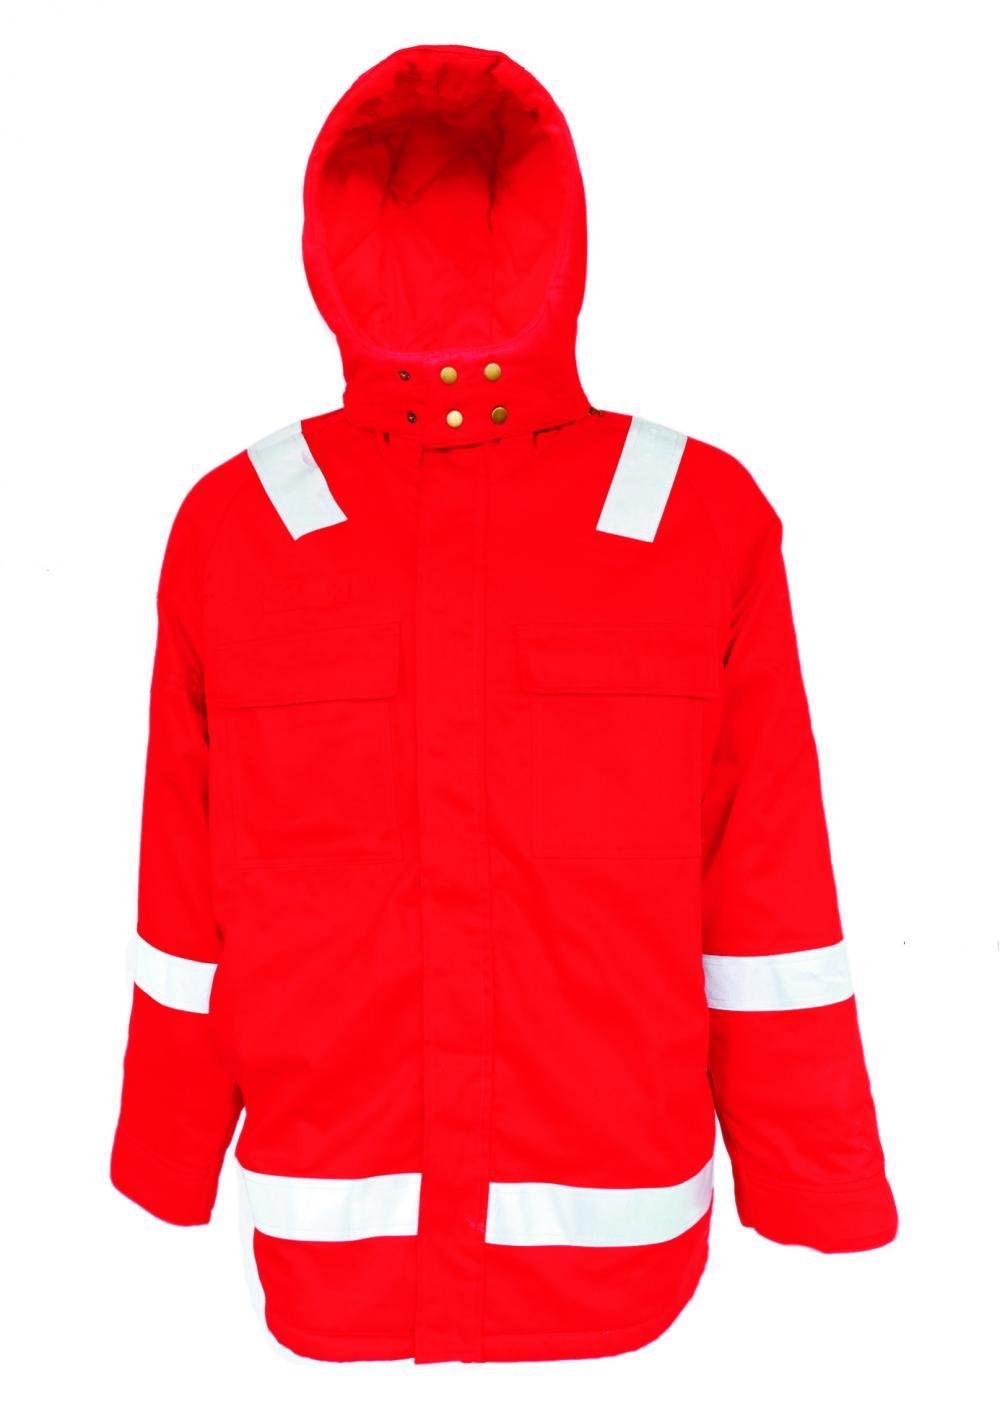 Qinter Fr Antistatic Jacket